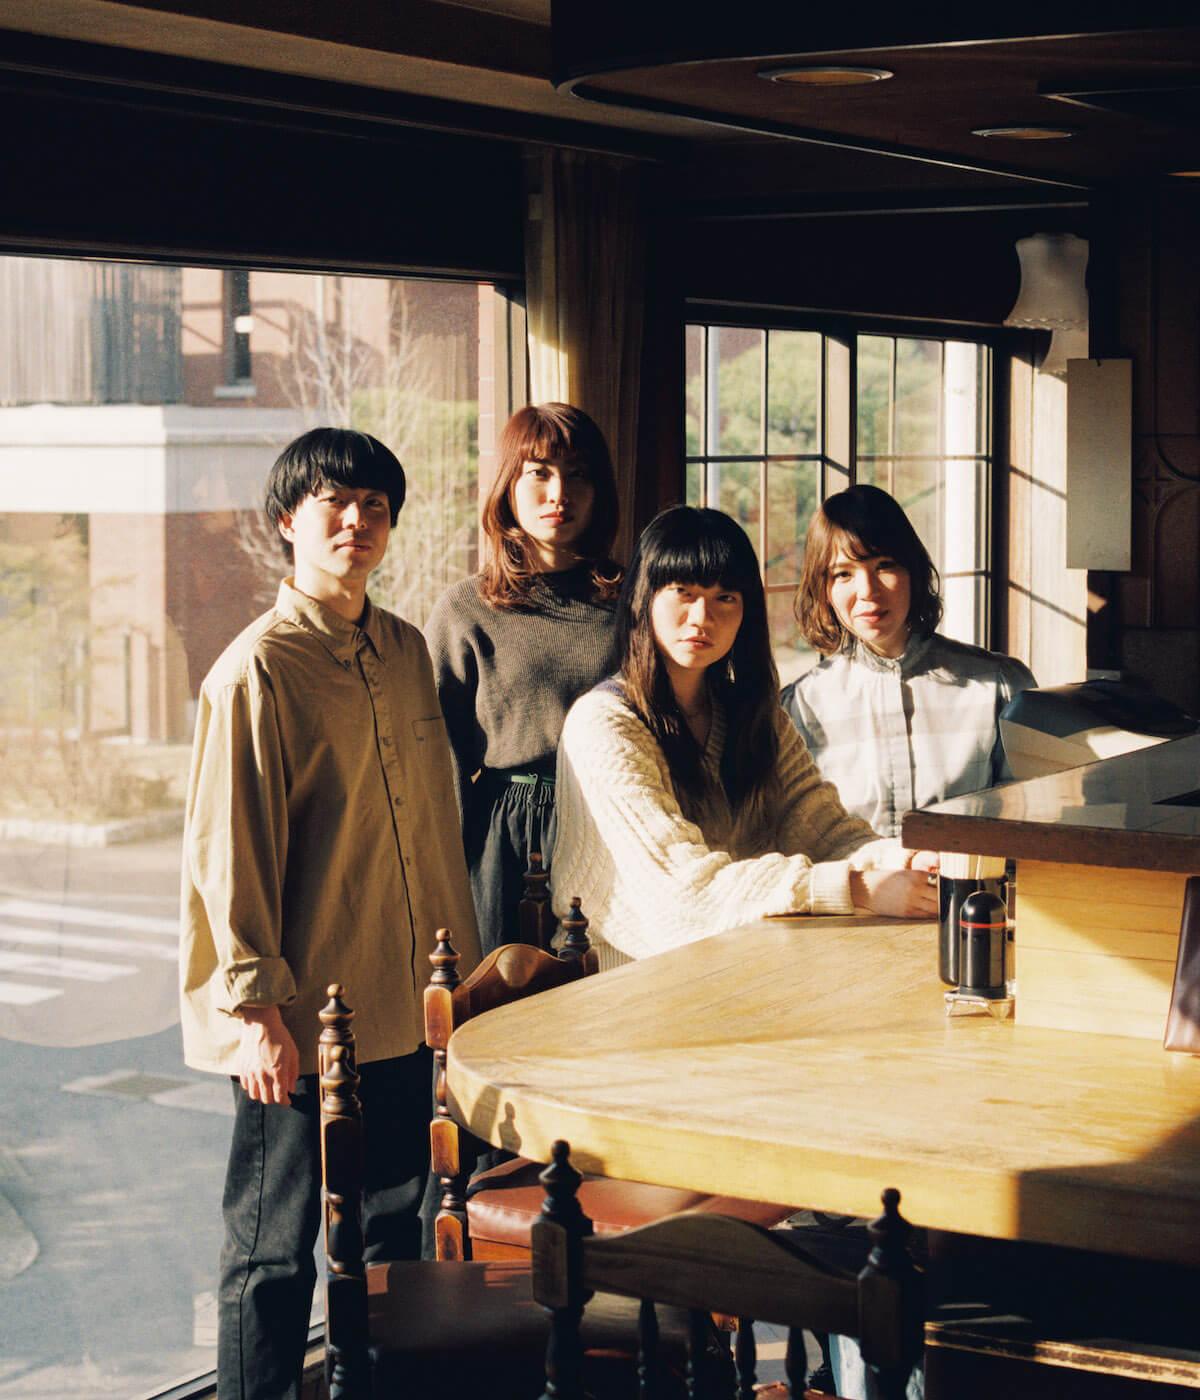 Homecomings、映画『愛がなんだ』の主題歌「Cakes」のMV公開|タワレコ新宿、京都にてインストアイベント開催も music190510-homecomings_info1